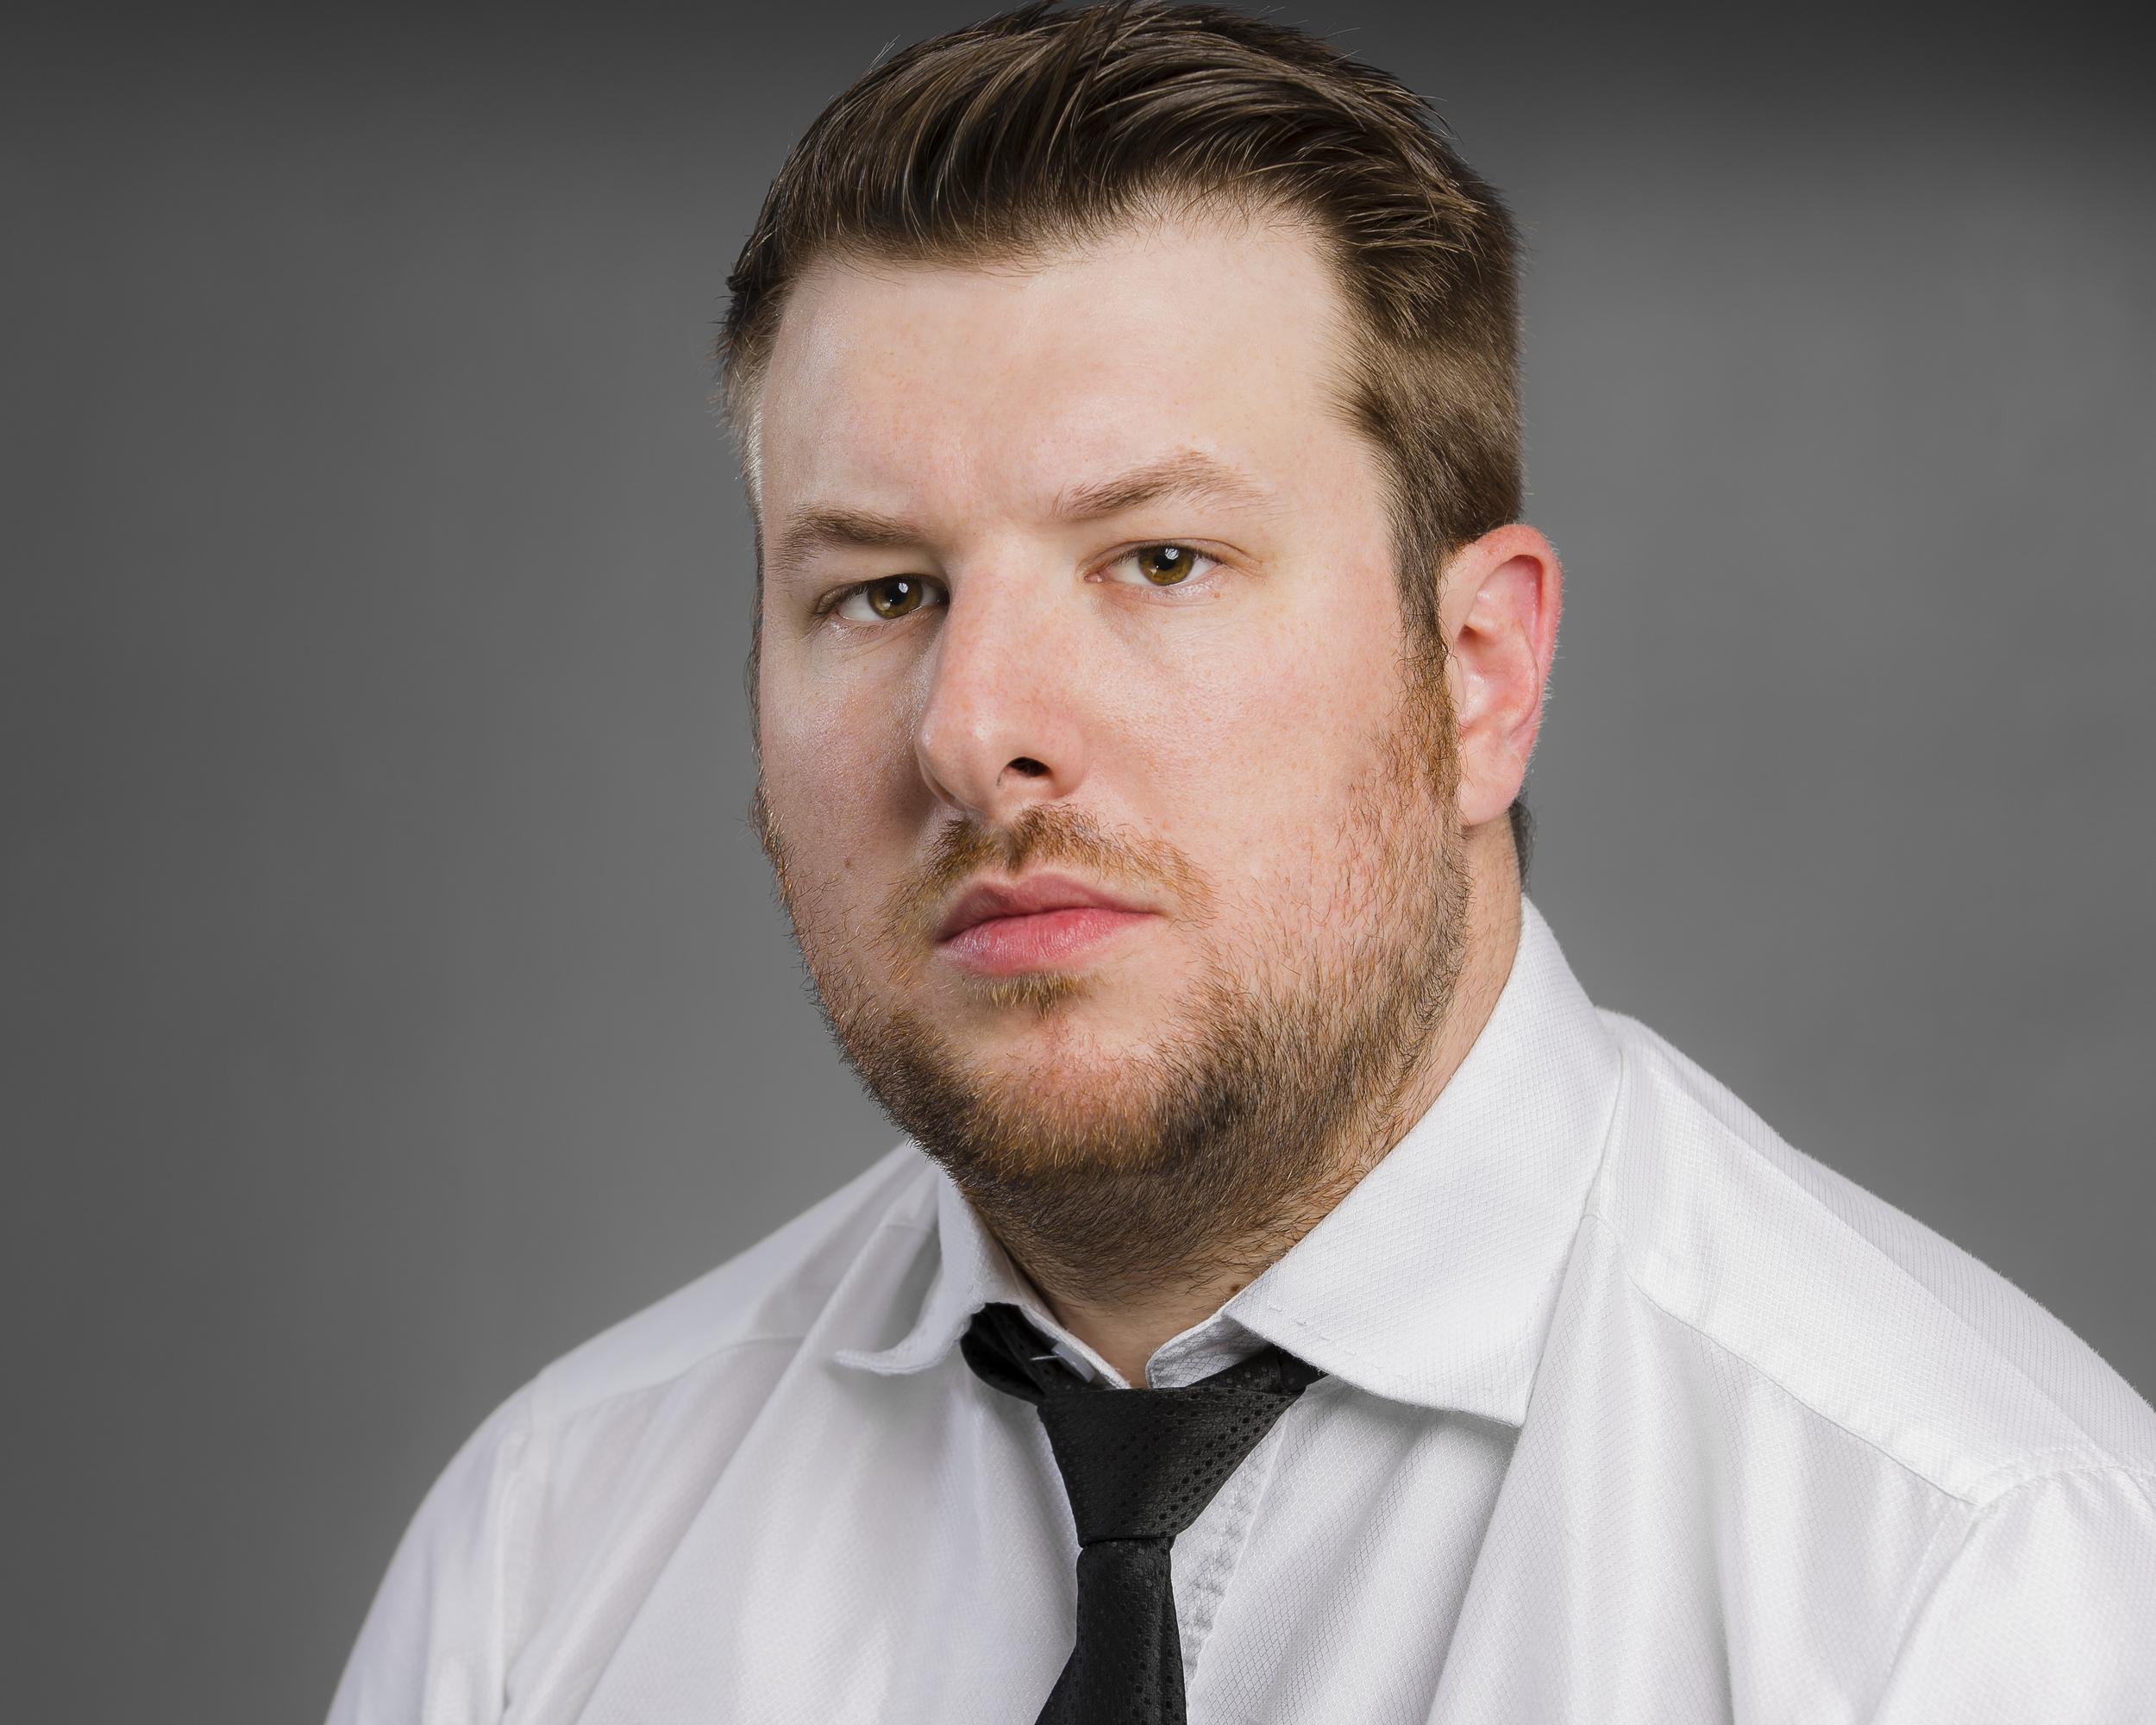 Matthew Gilmore Actor Headshot